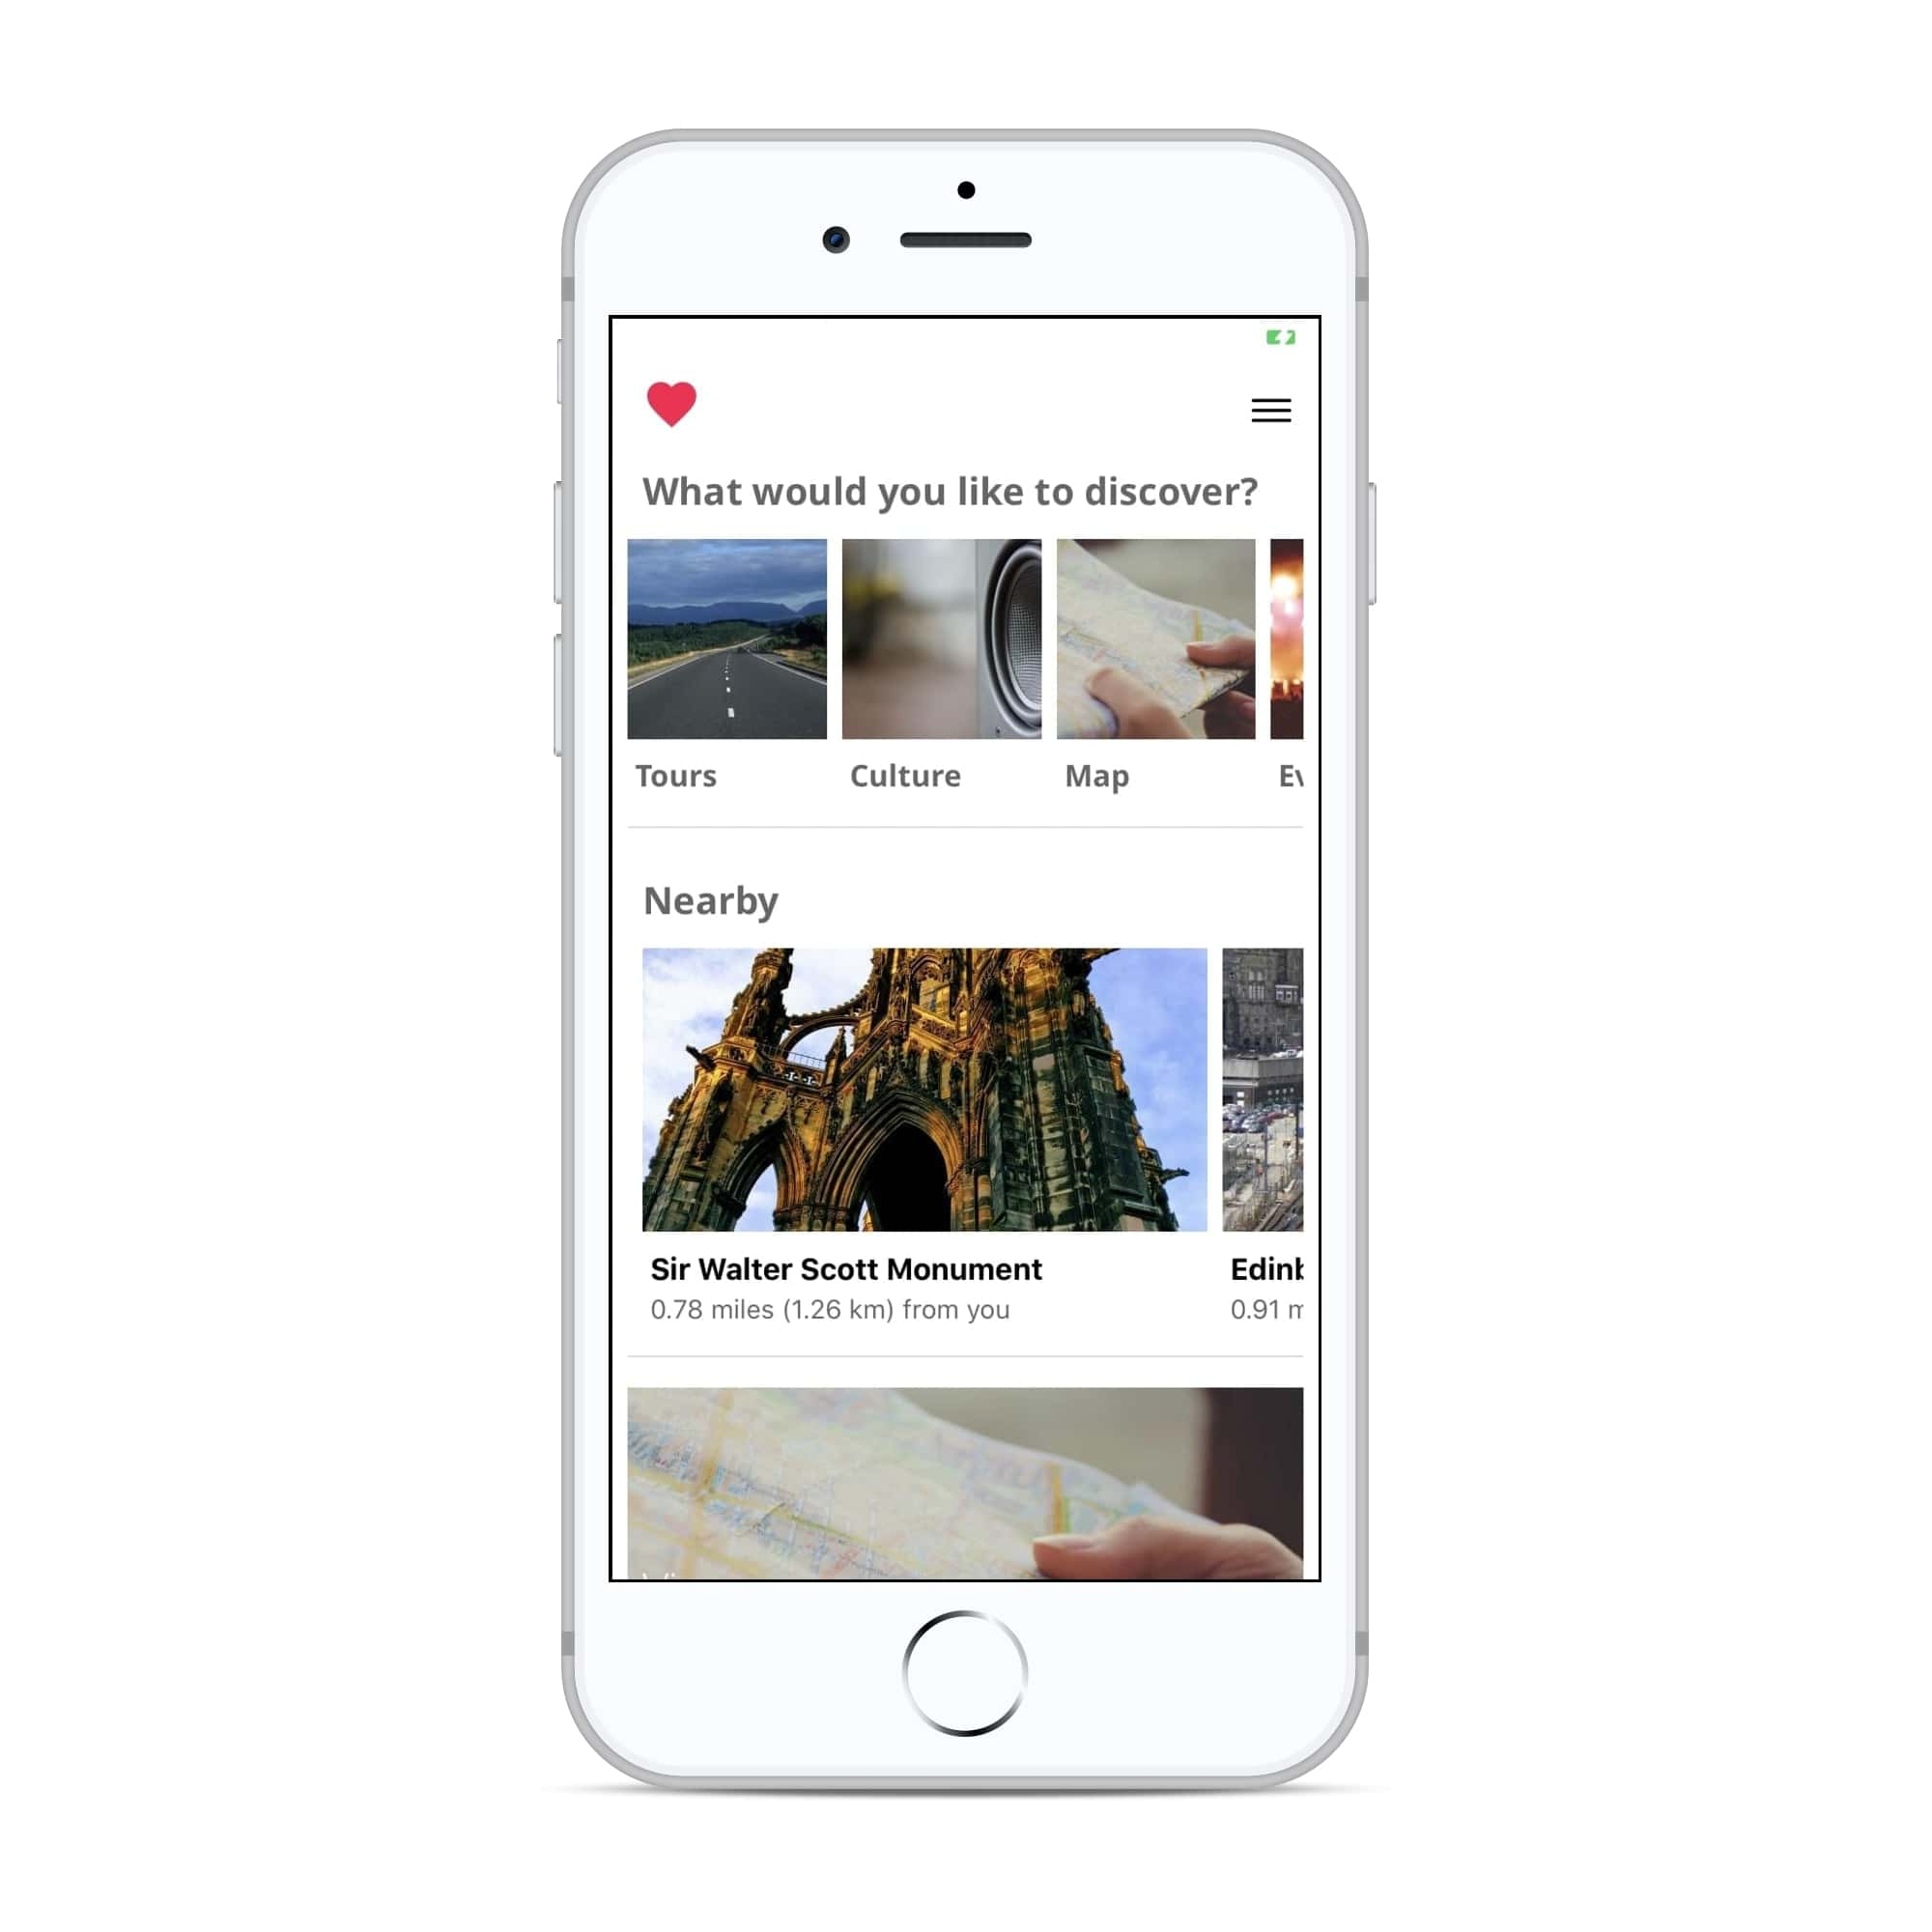 Phone showing app homescreen